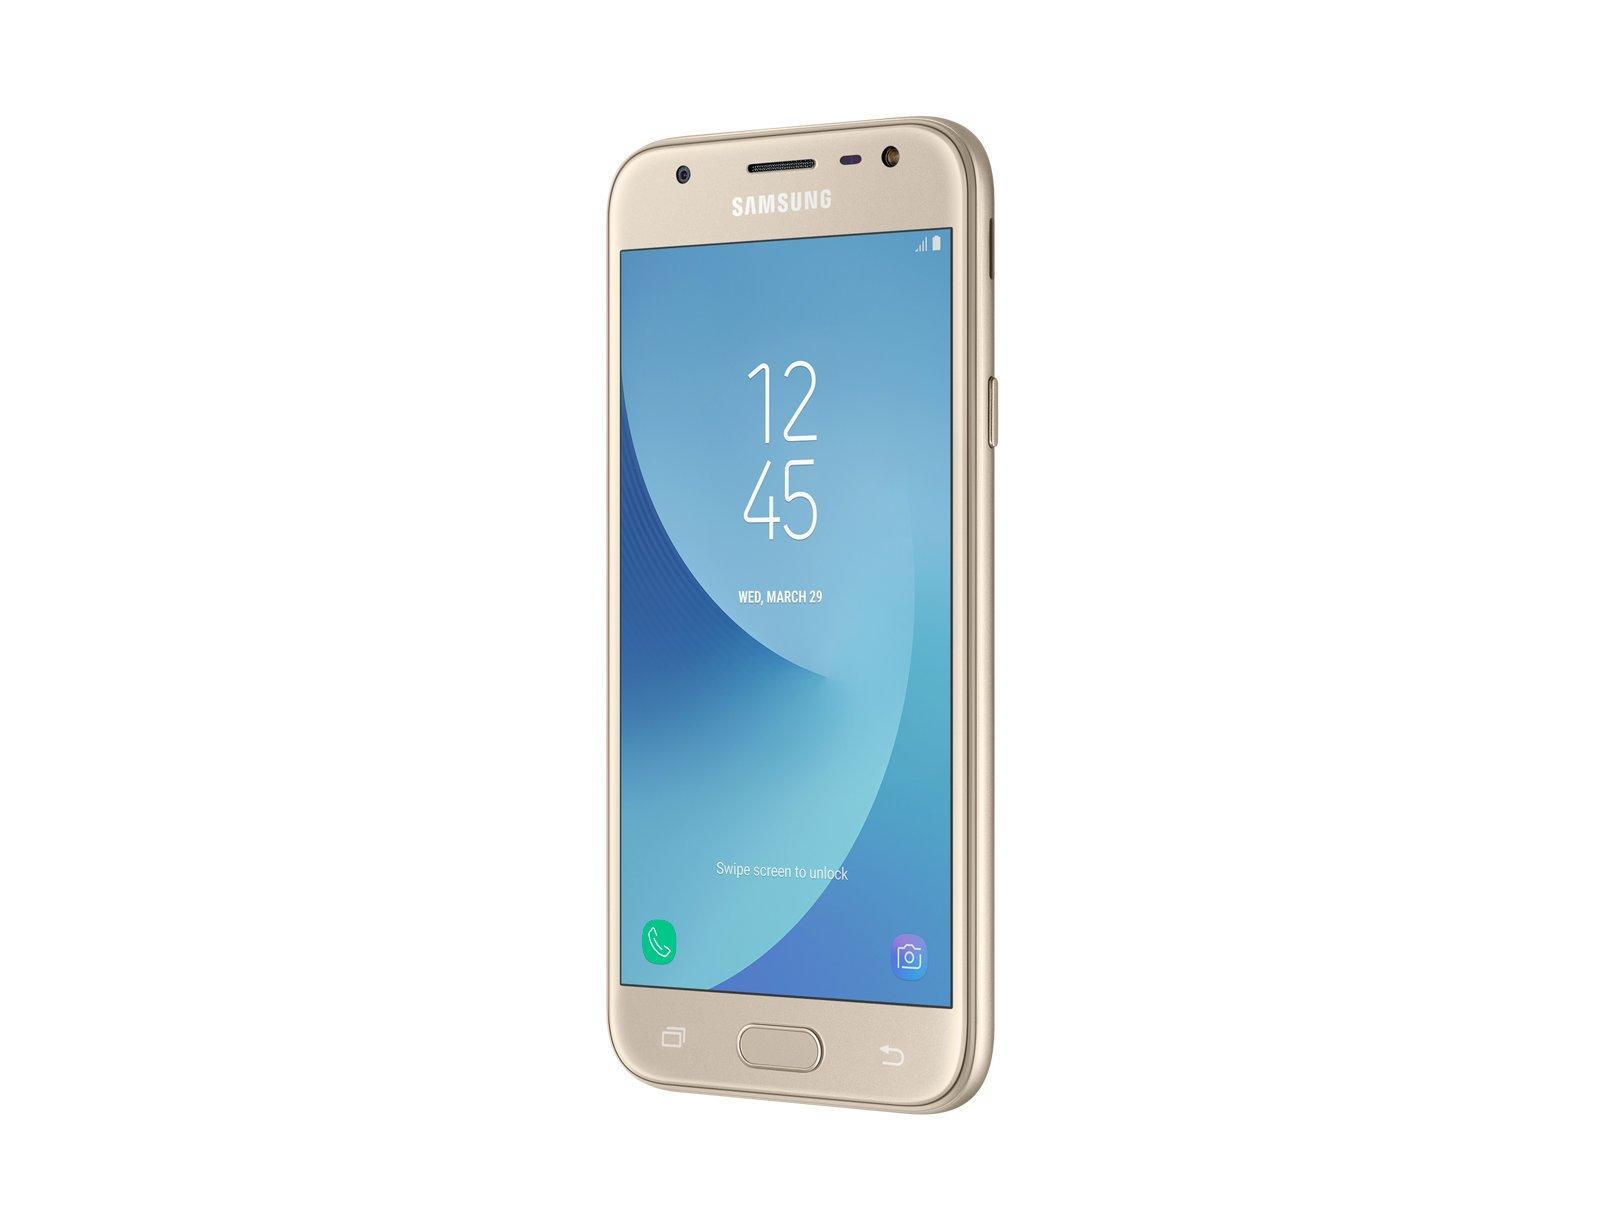 Samsung Galaxy J3 (2017) technische daten, test, review ...